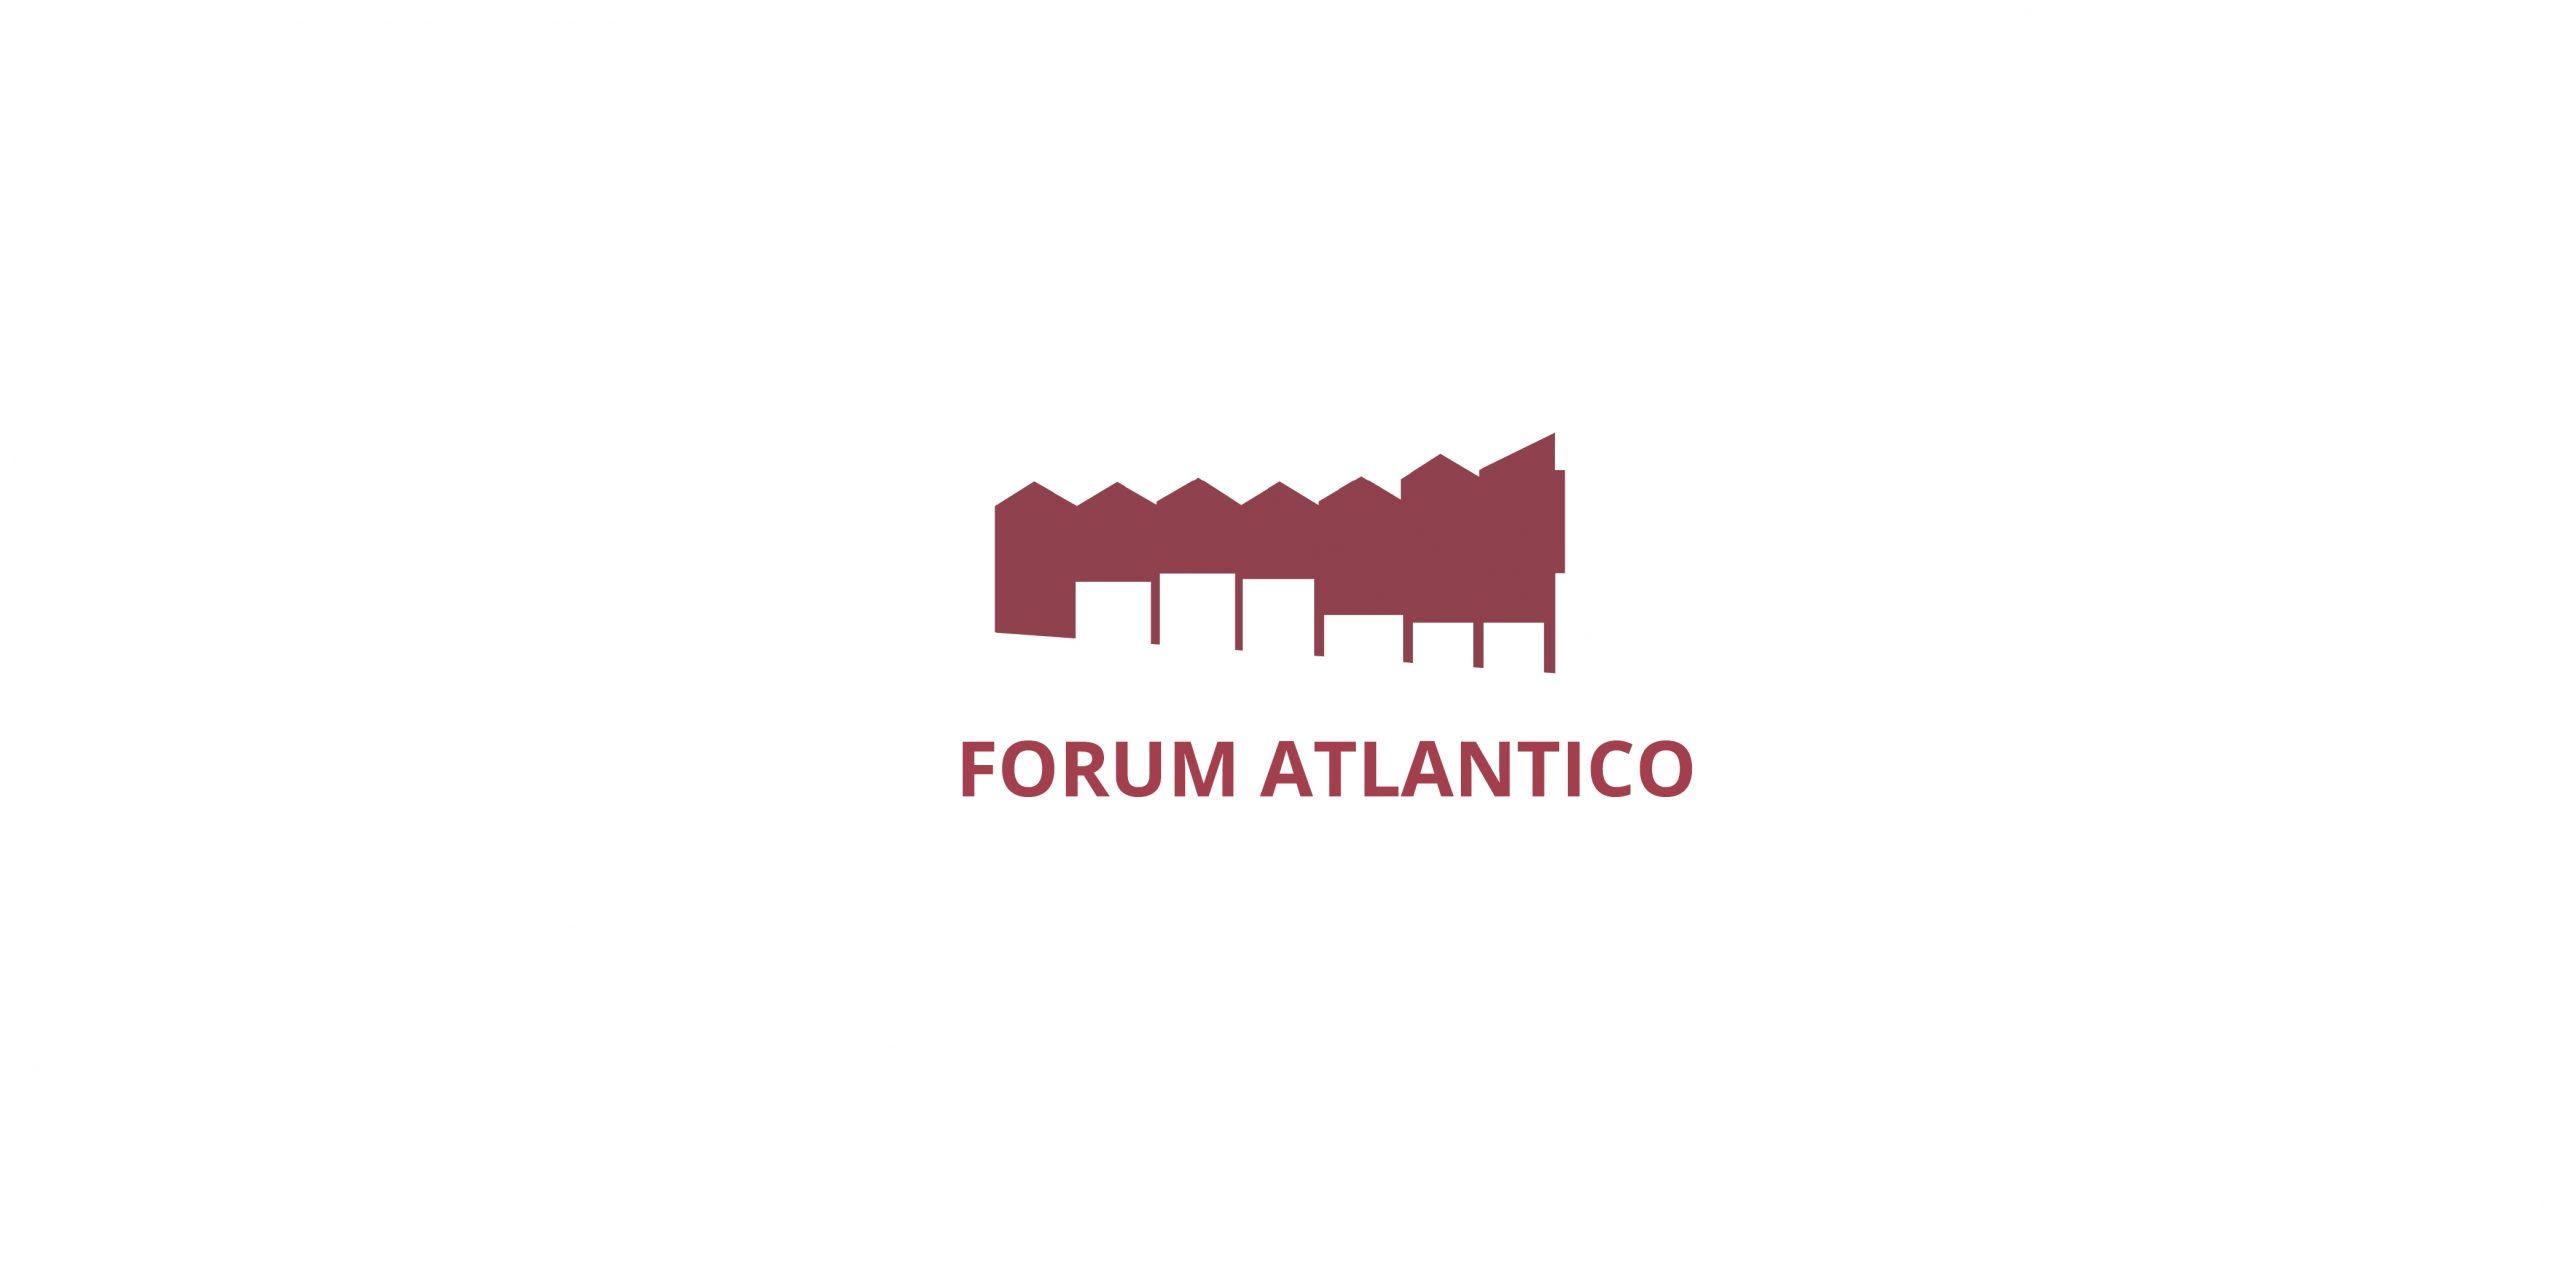 Fórum atlántico